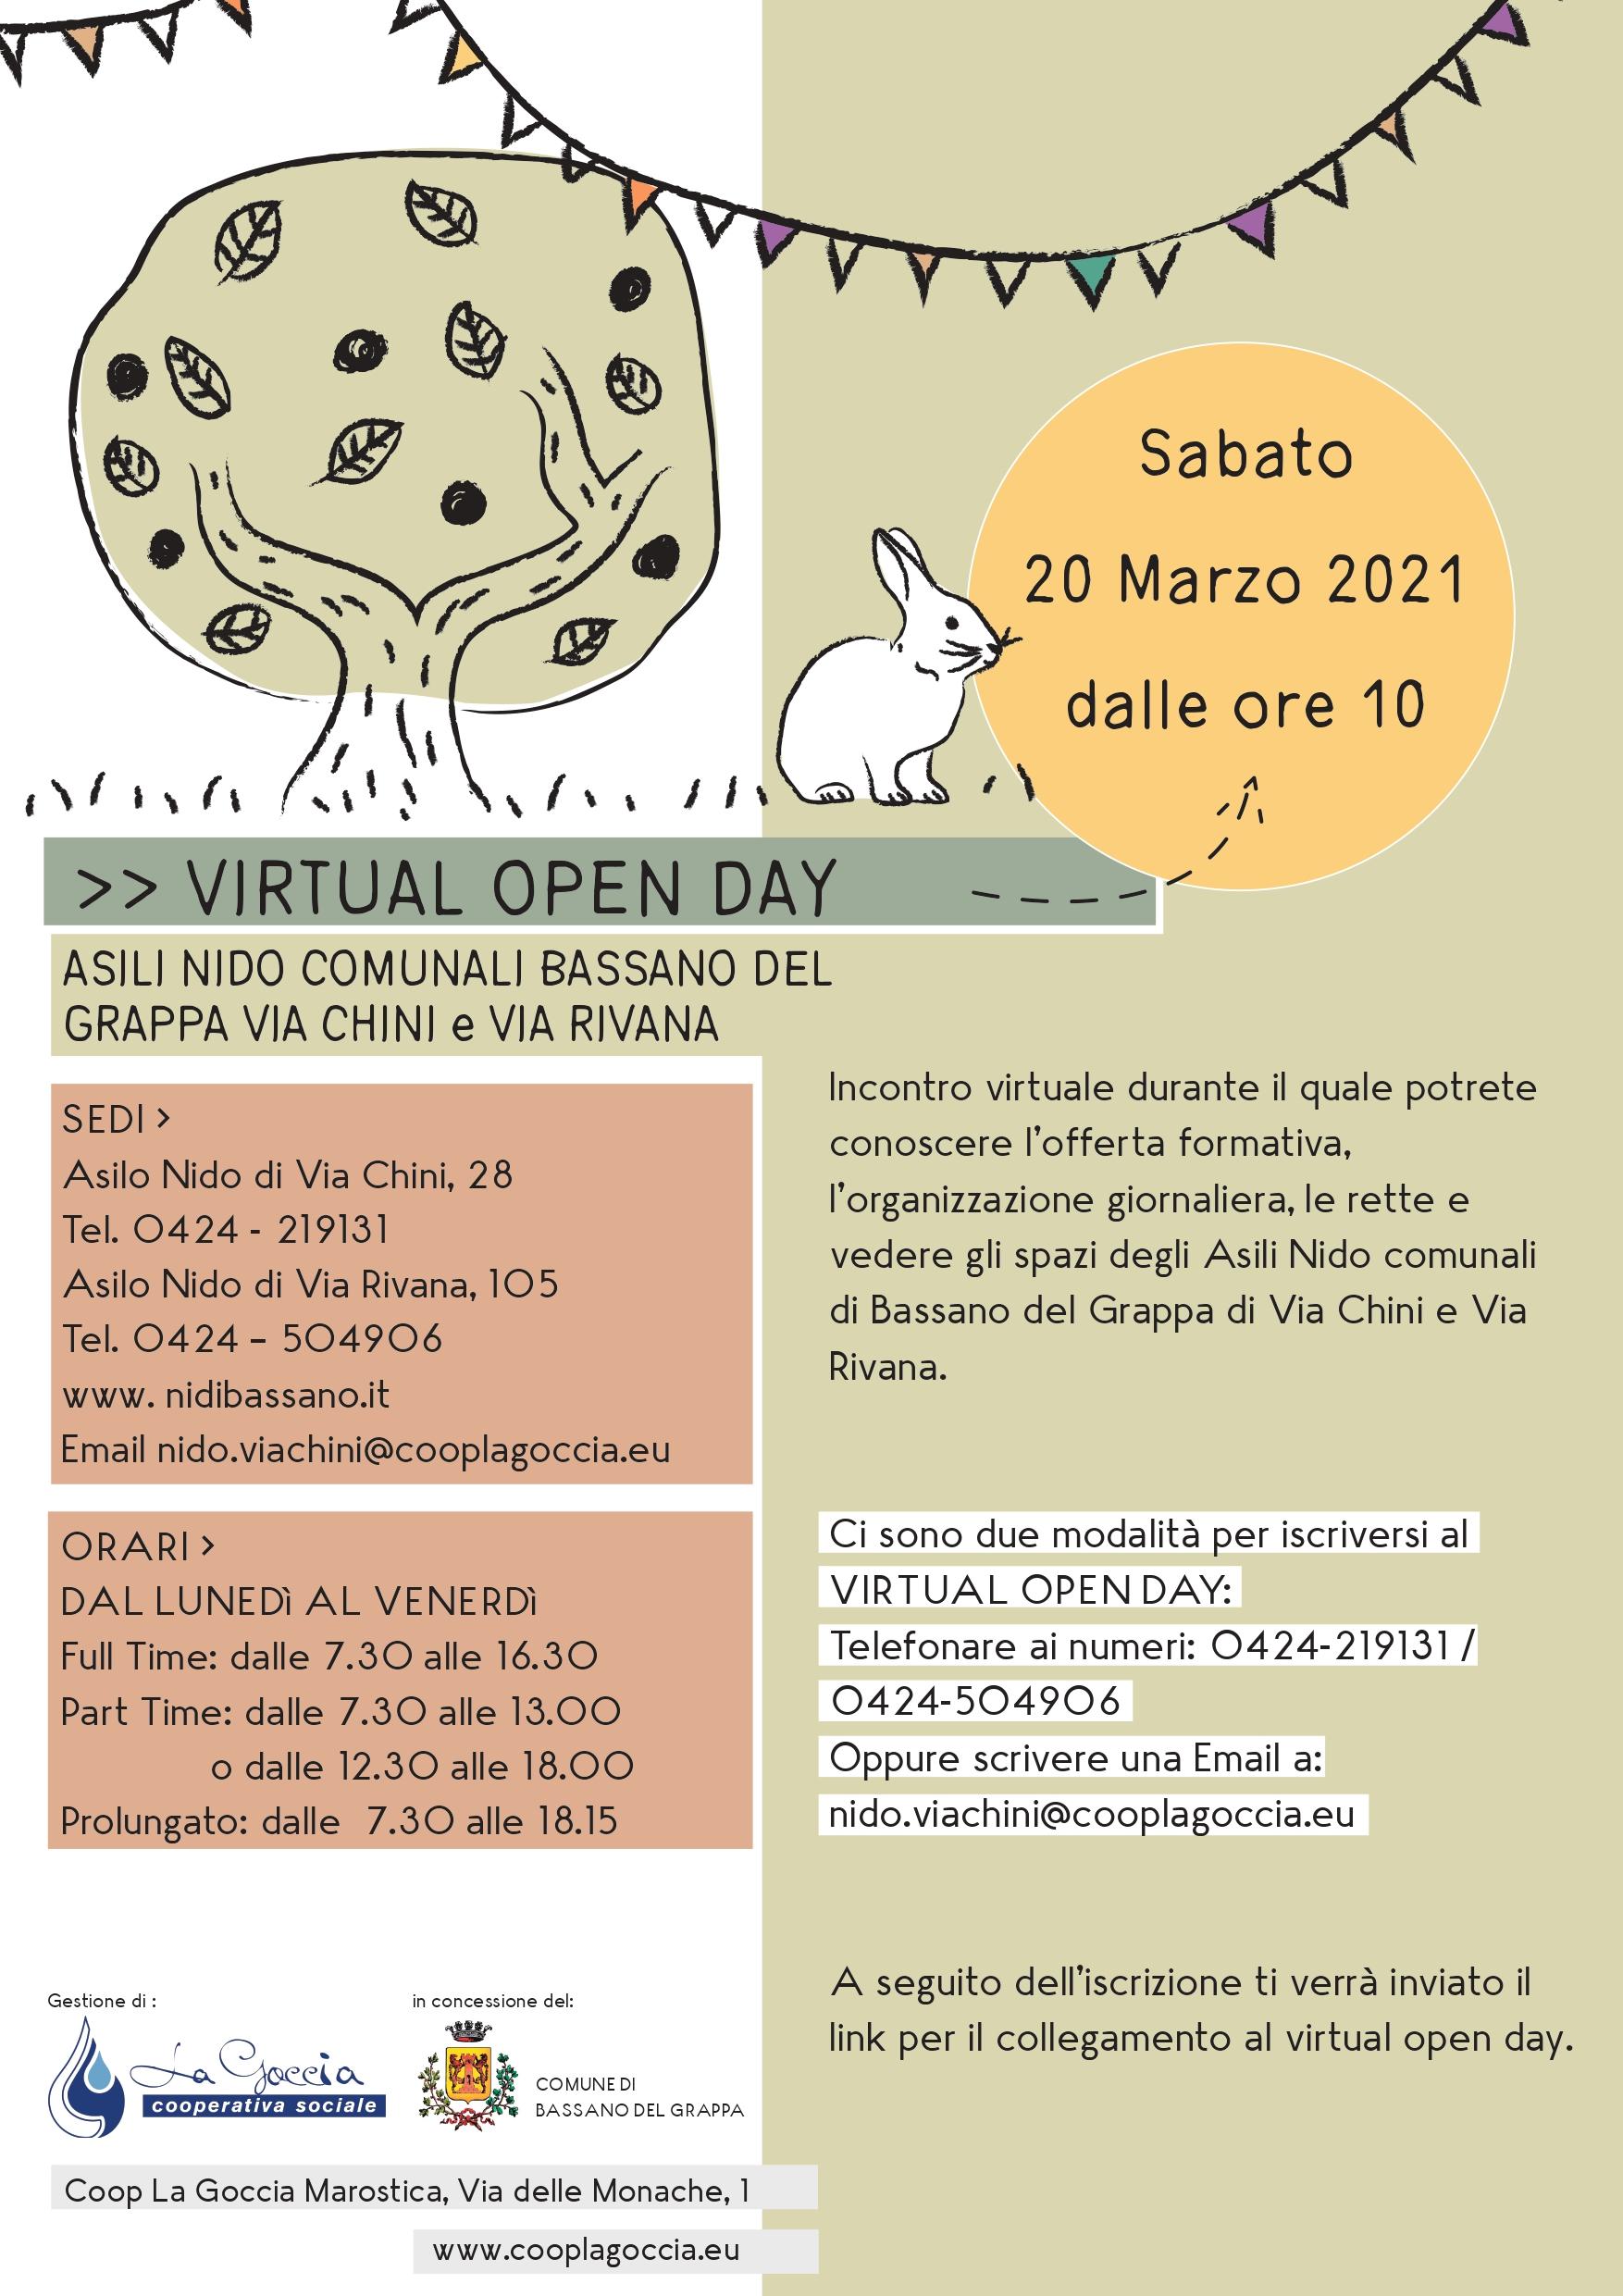 open day nidi bassano 2021